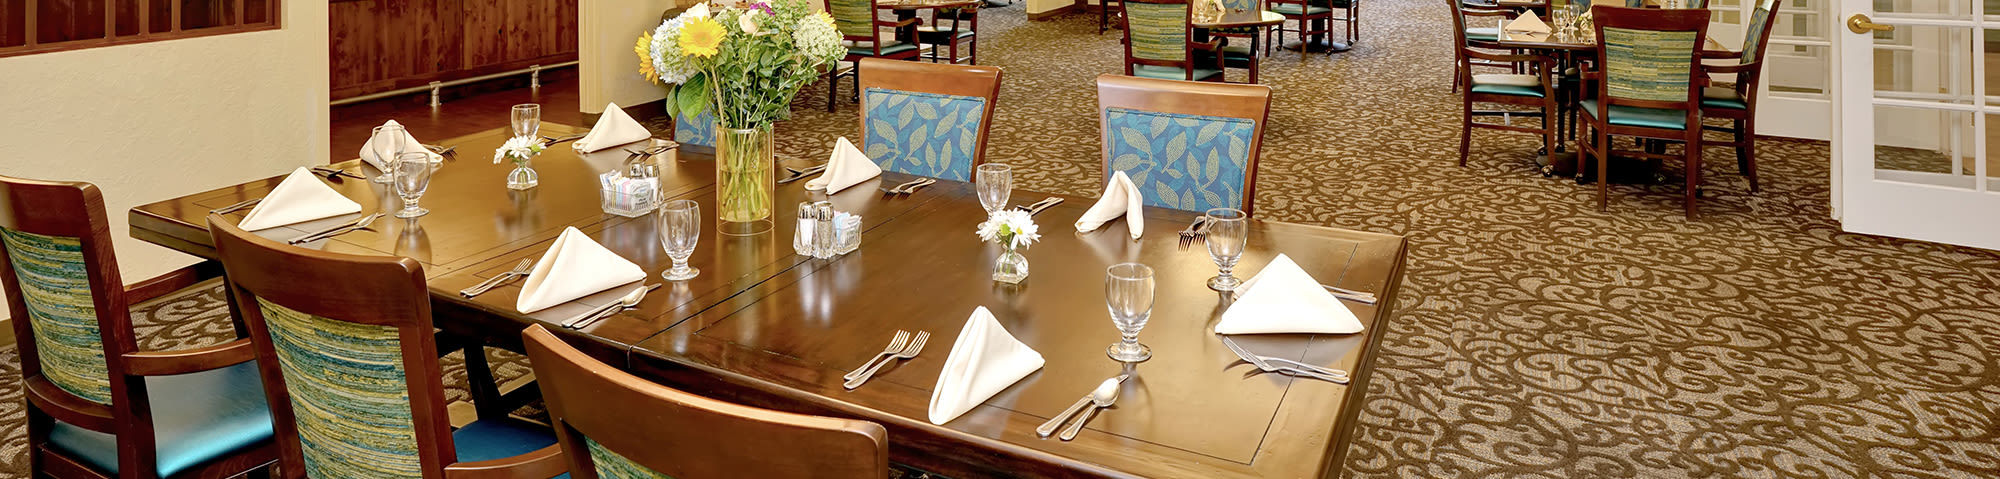 Dining experience at Cottonwood Creek in Salt Lake City, Utah